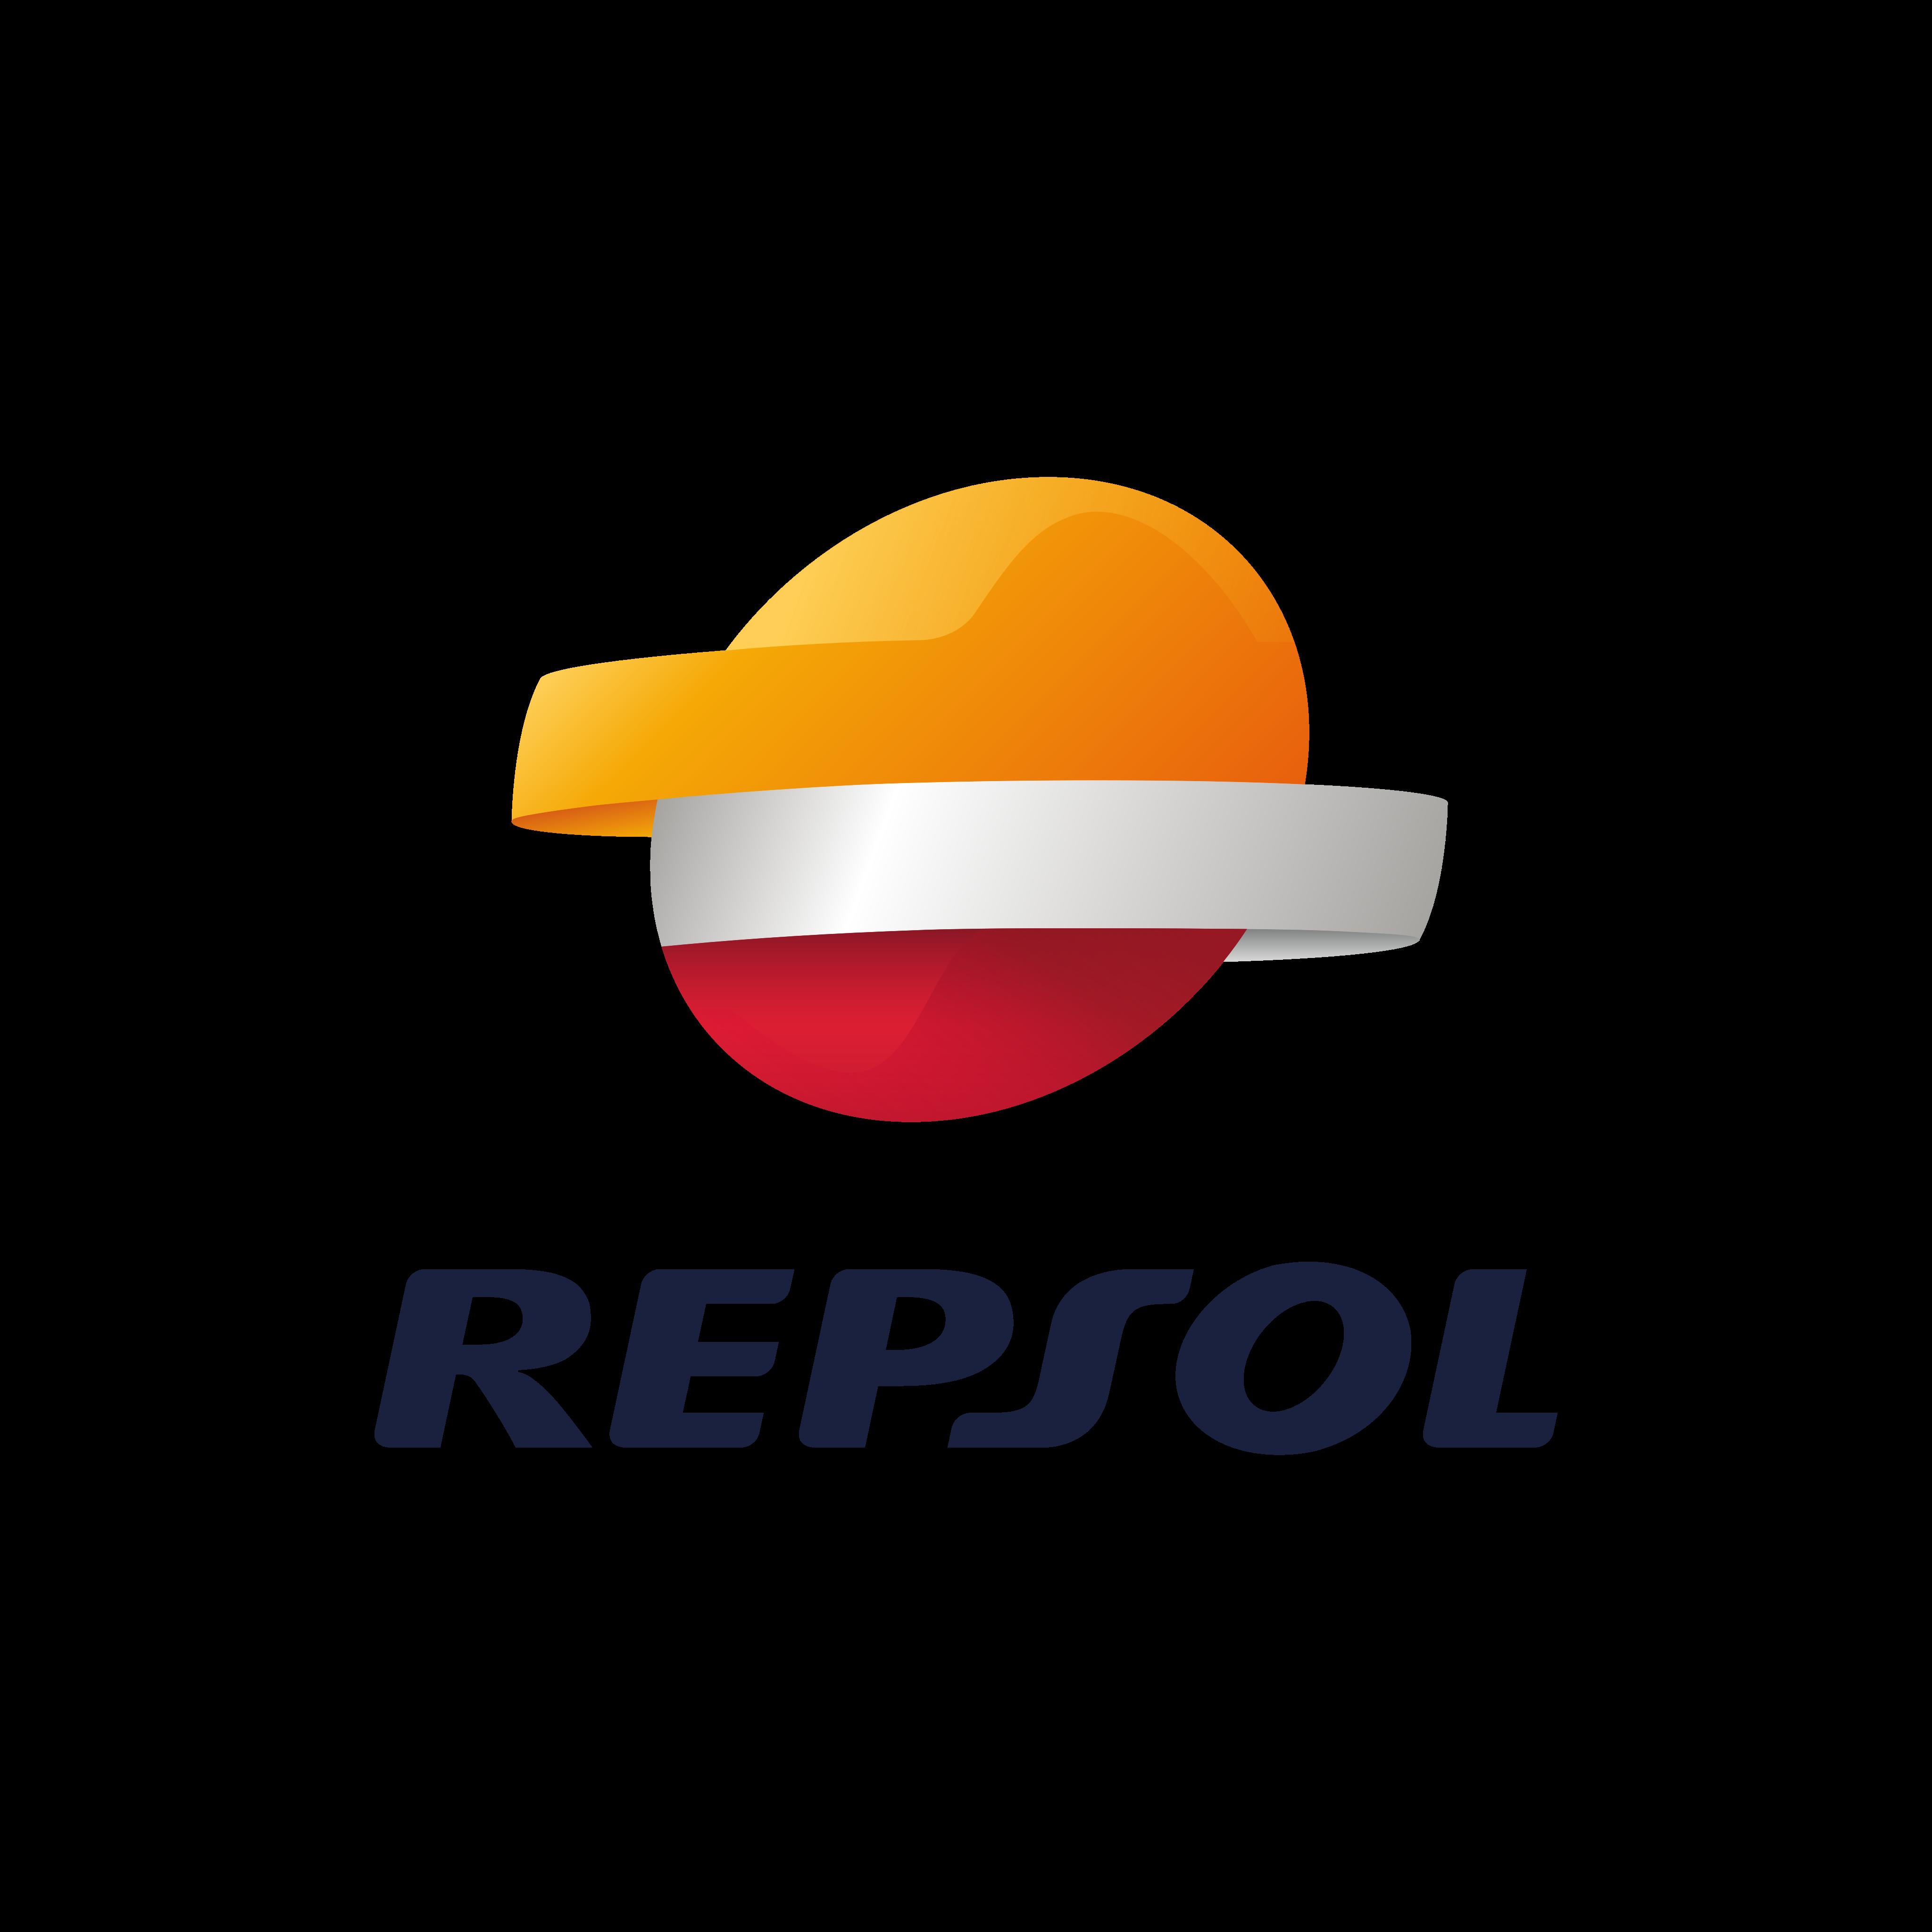 repsol logo 0 - Repsol Logo